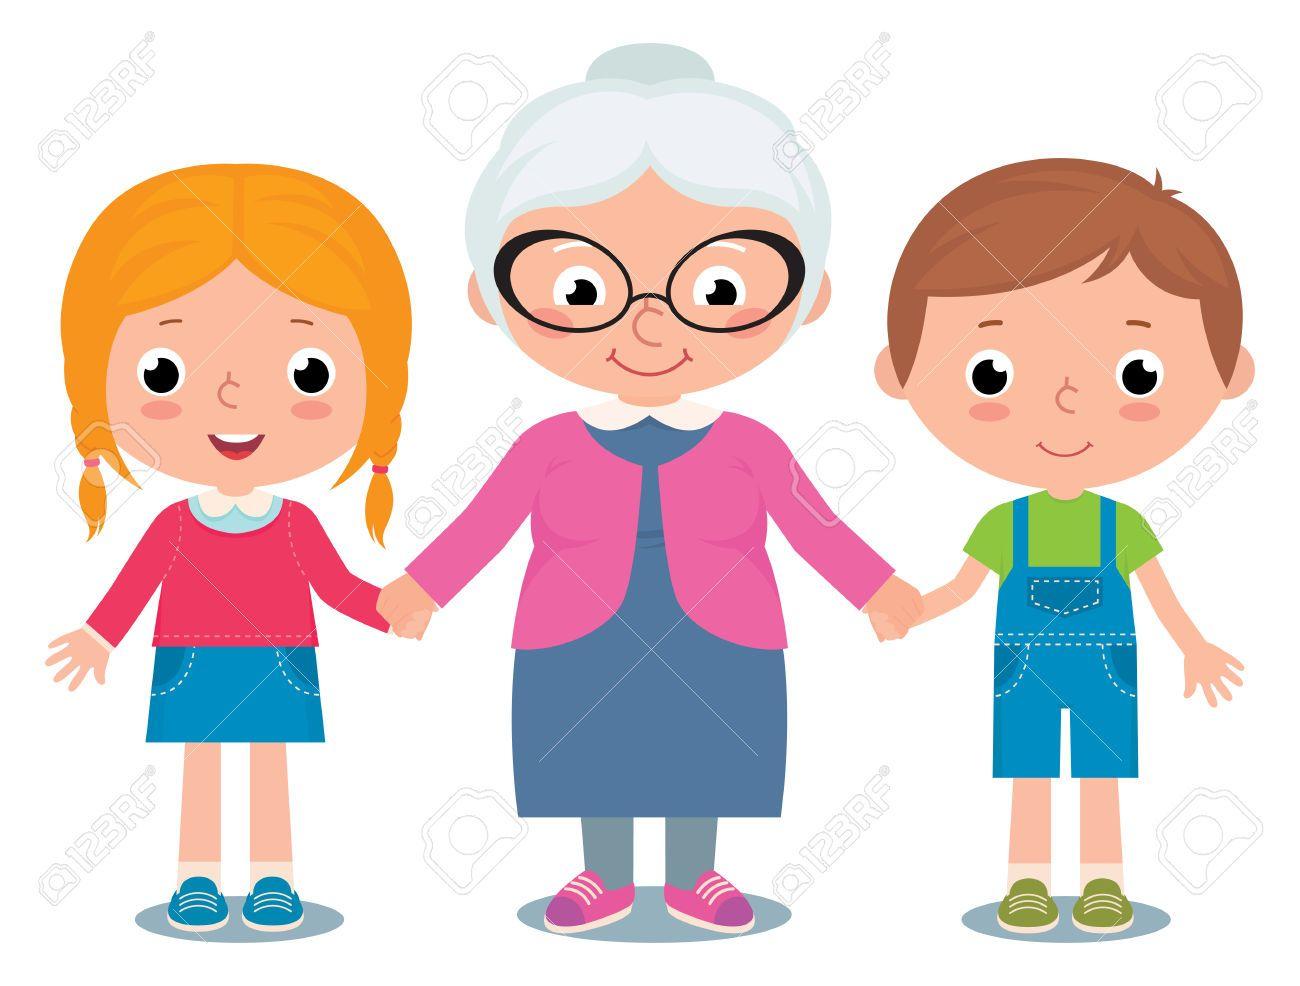 Dibujos Abuela Con Nietos - Buscar Con Google